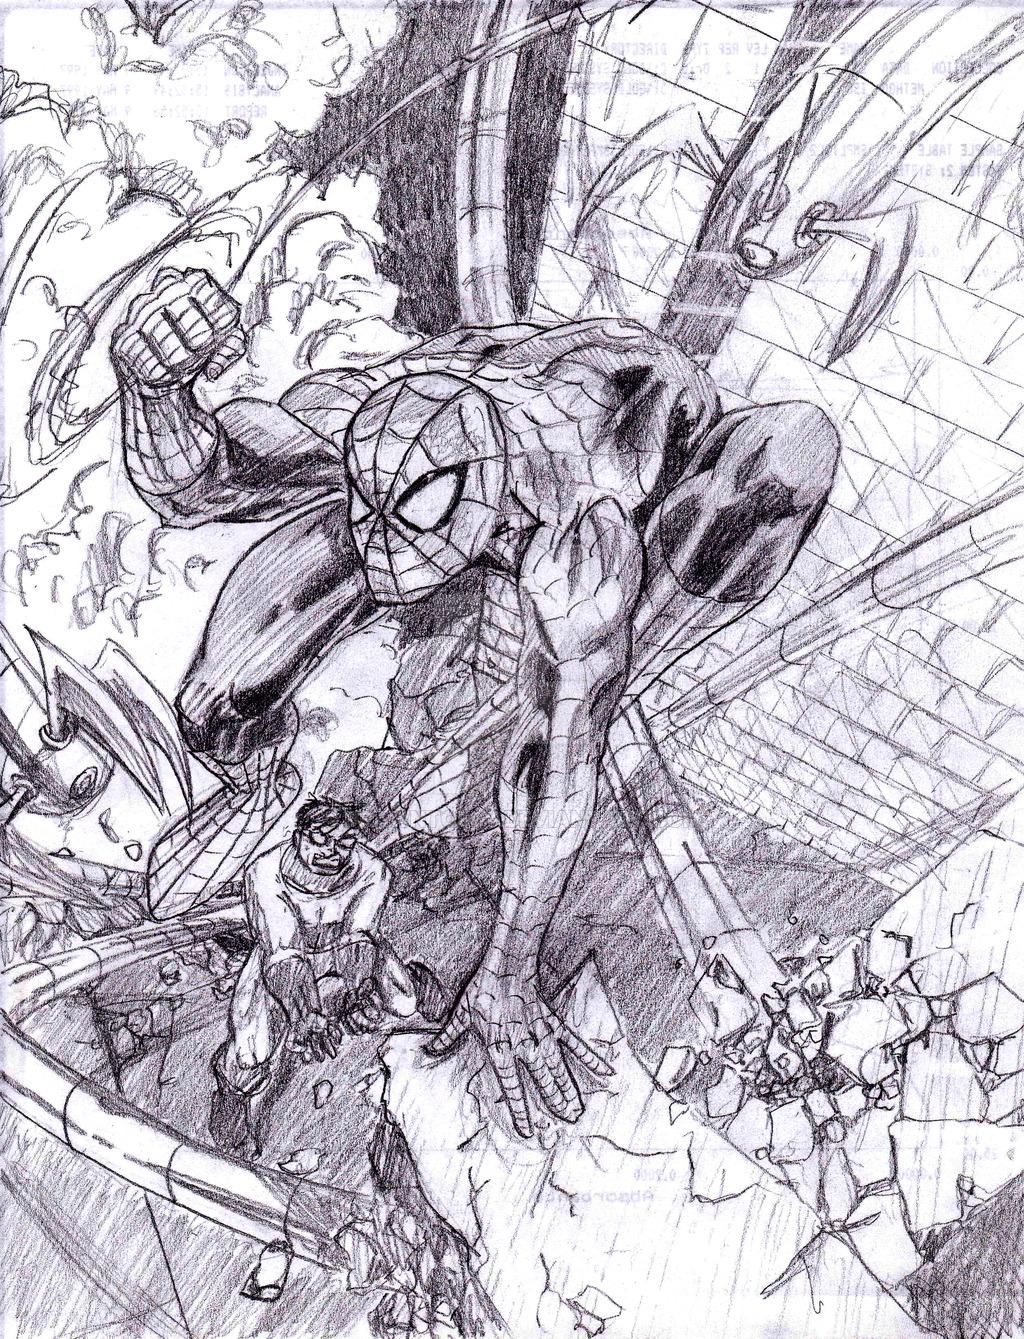 Drawn spiderman fighting Fighting drawntofly Spiderman Fighting Spiderman